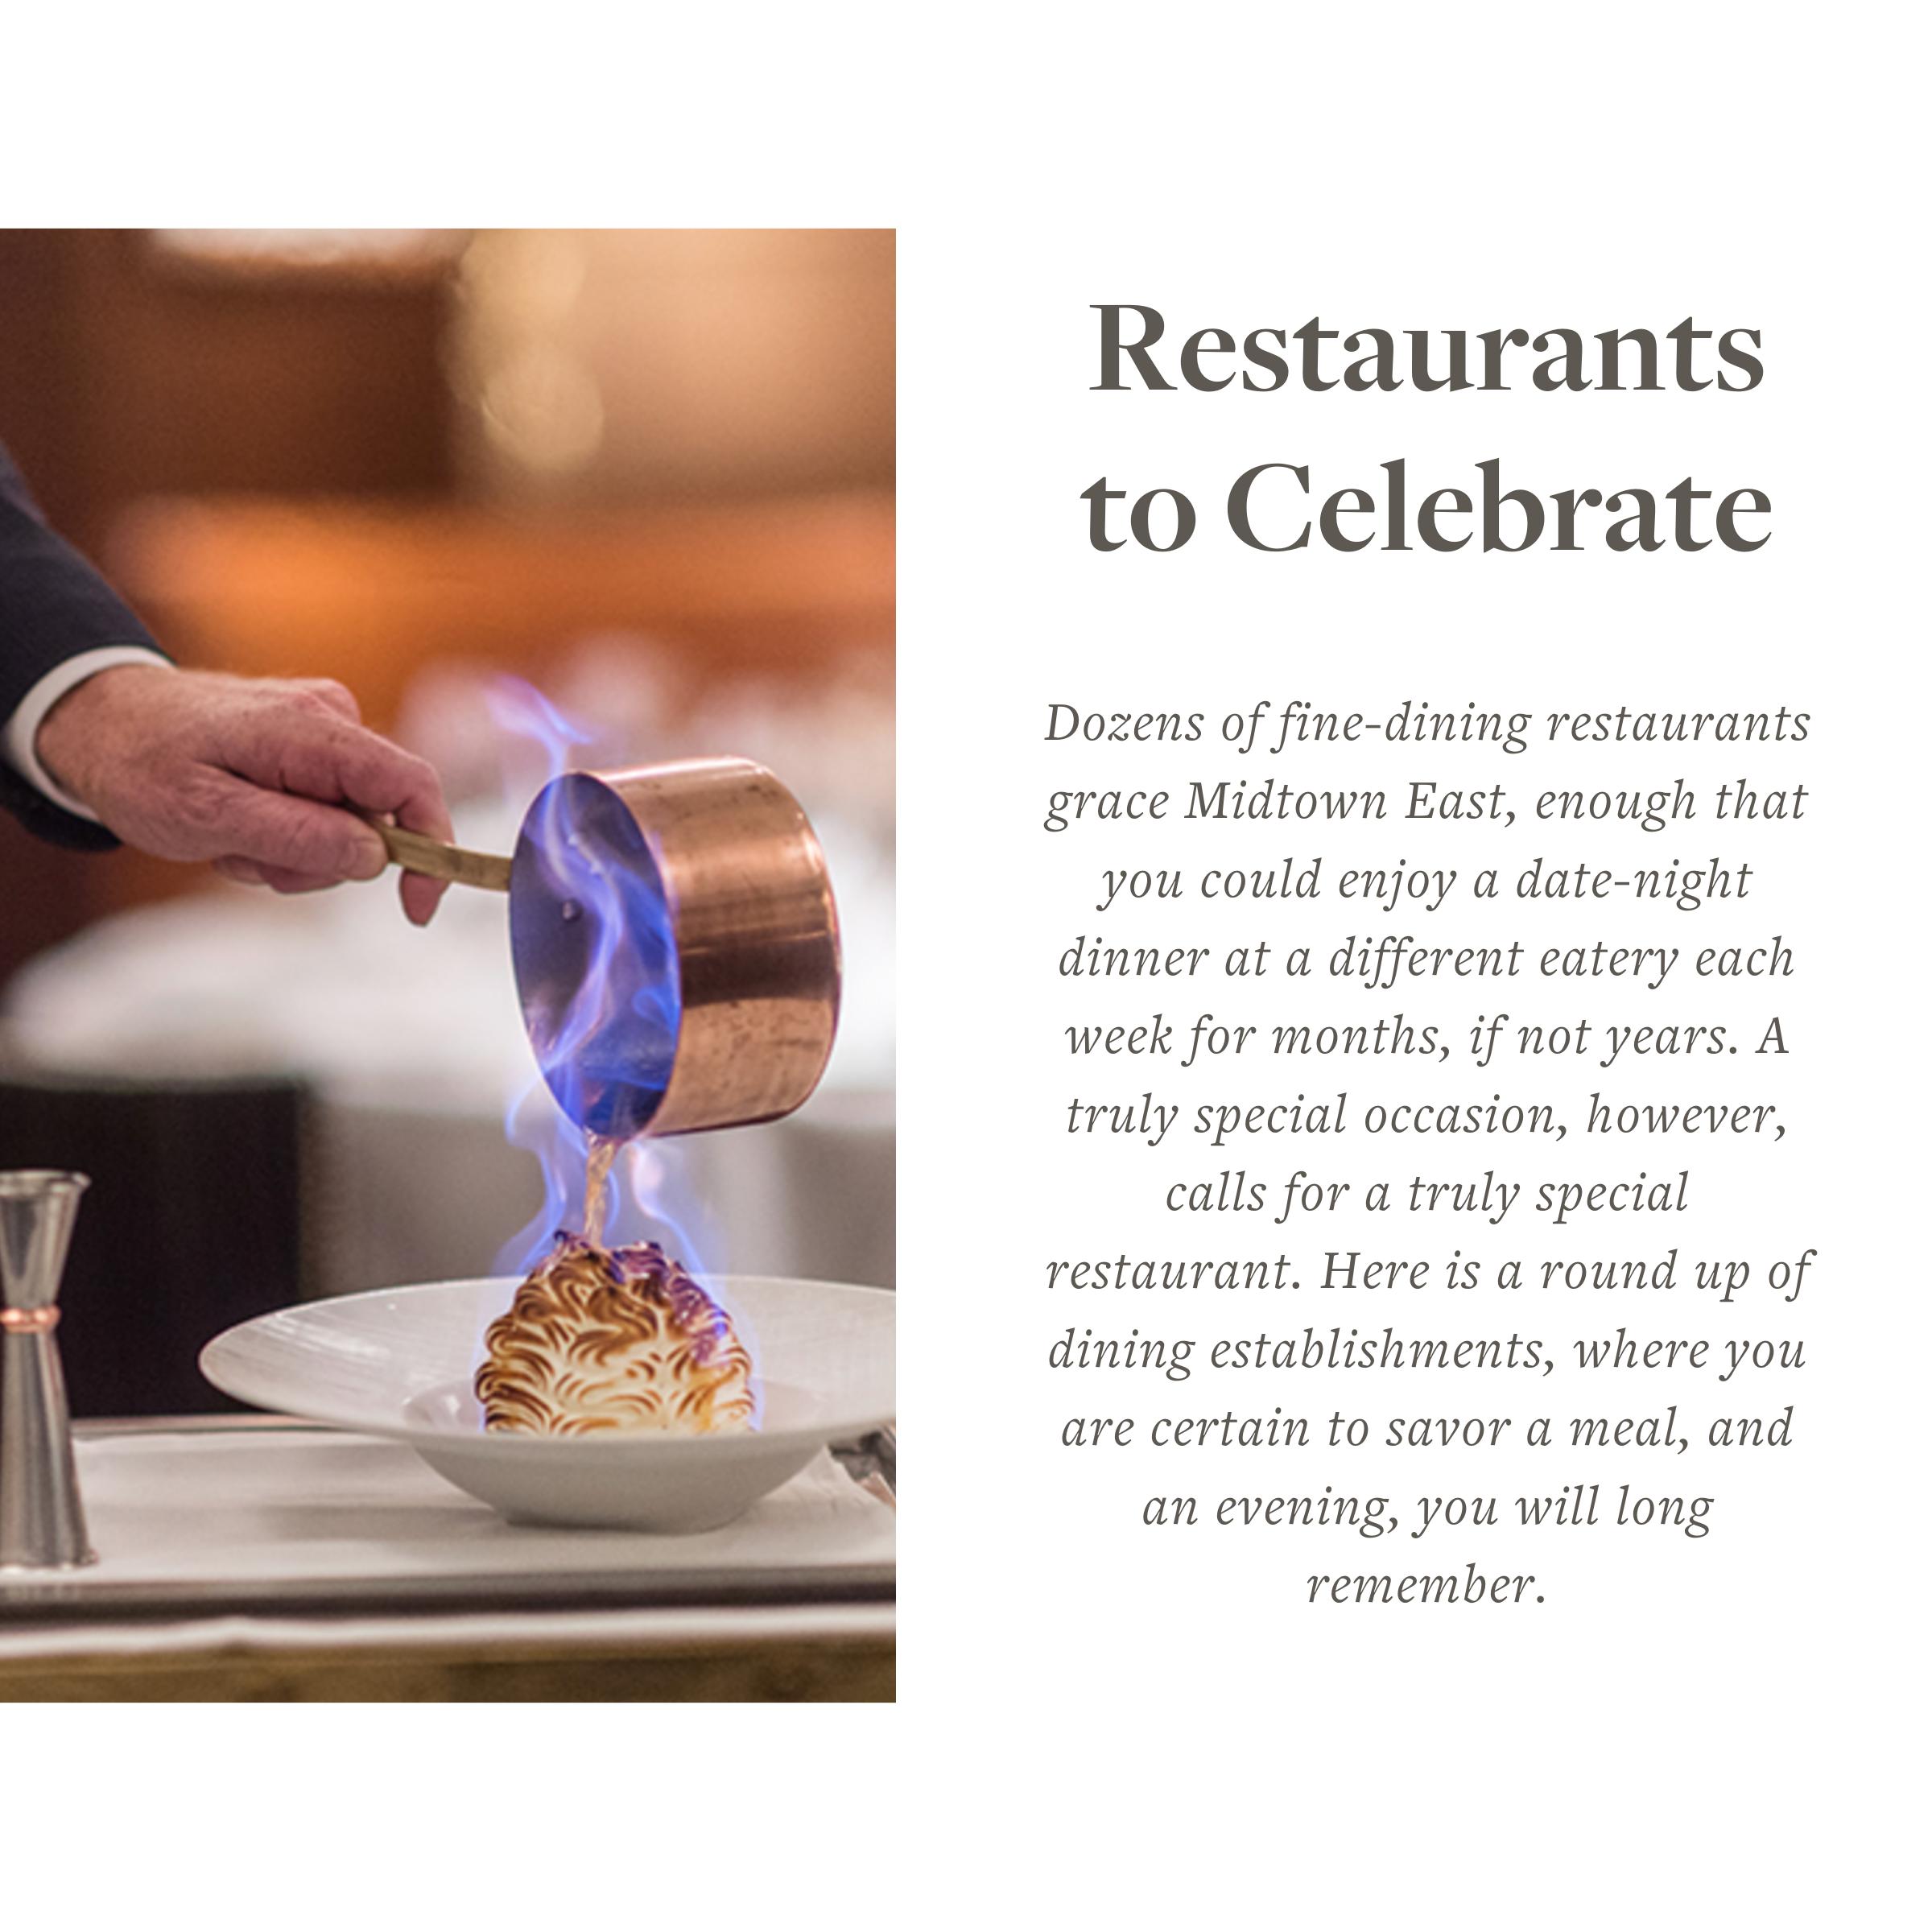 2_Restaurants to Celebrate